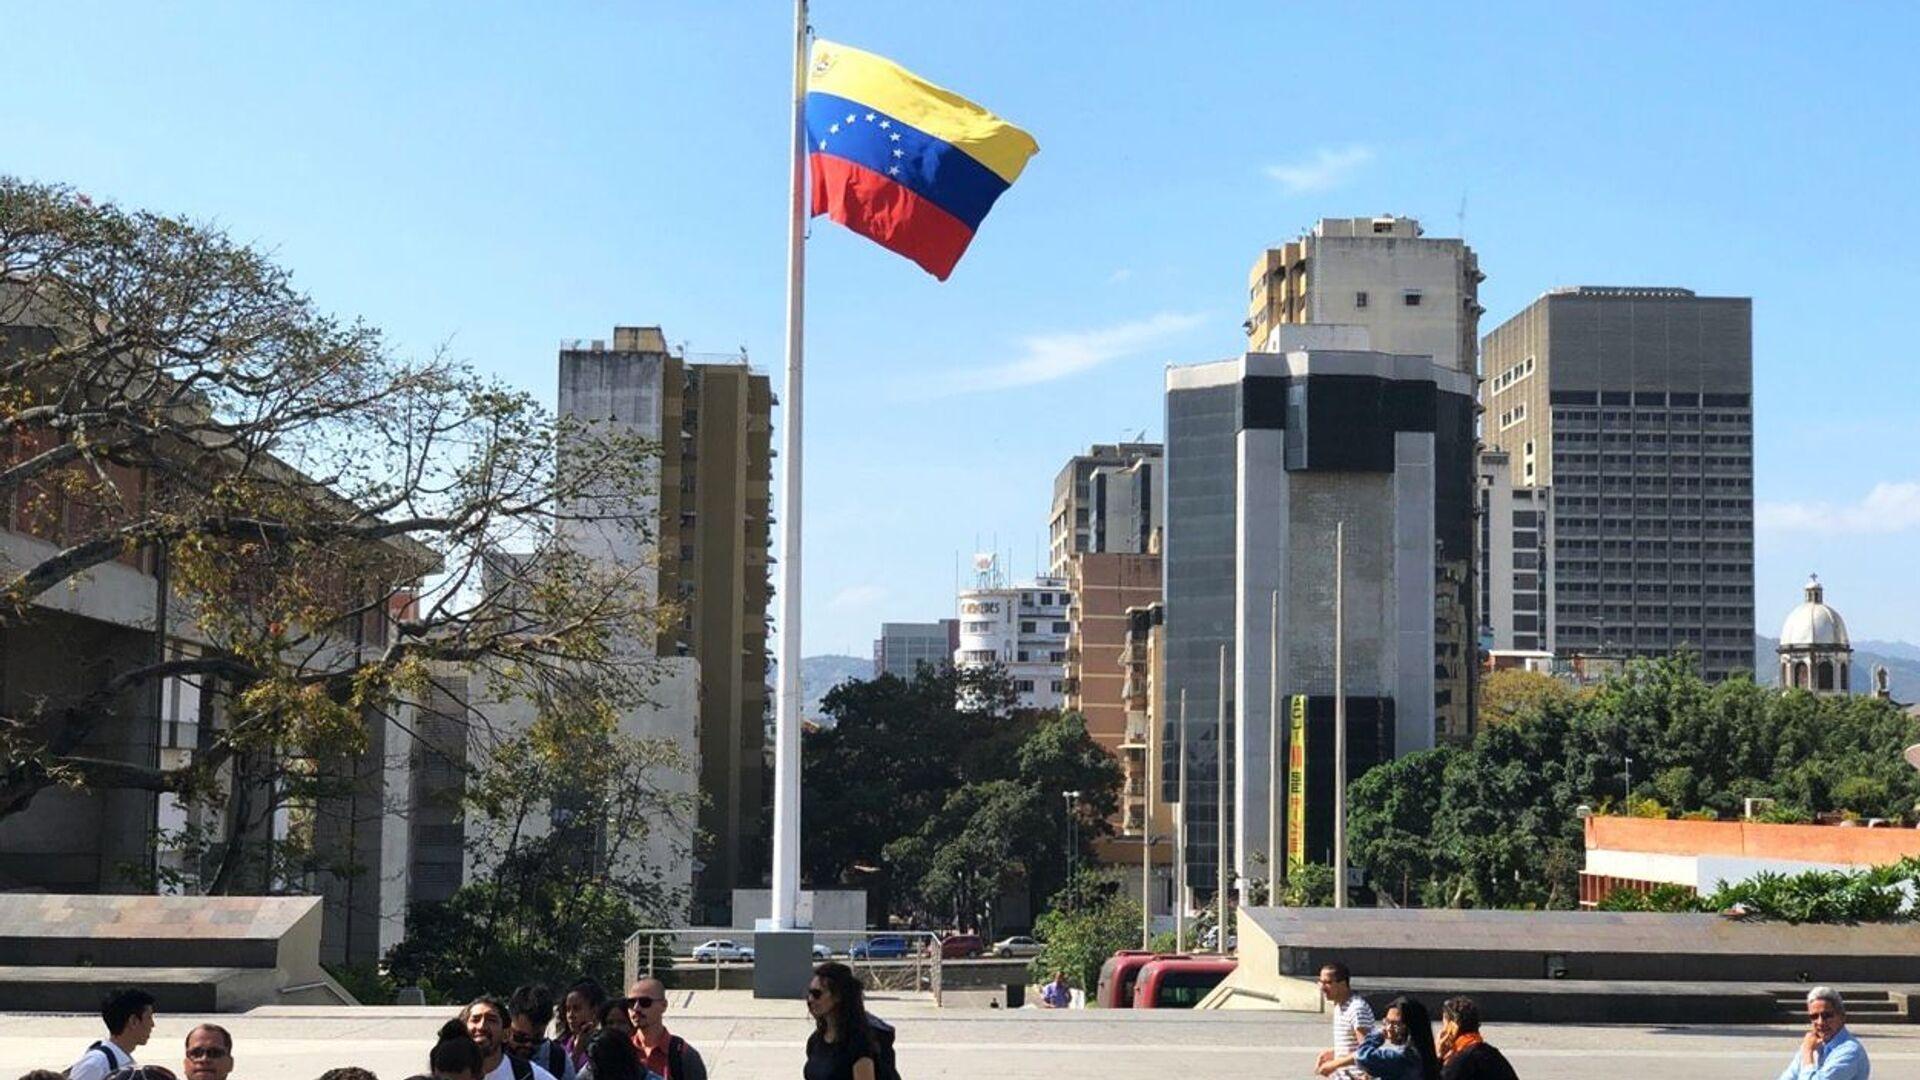 La bandiera del Venezuela, Caracas - Sputnik Italia, 1920, 24.02.2021